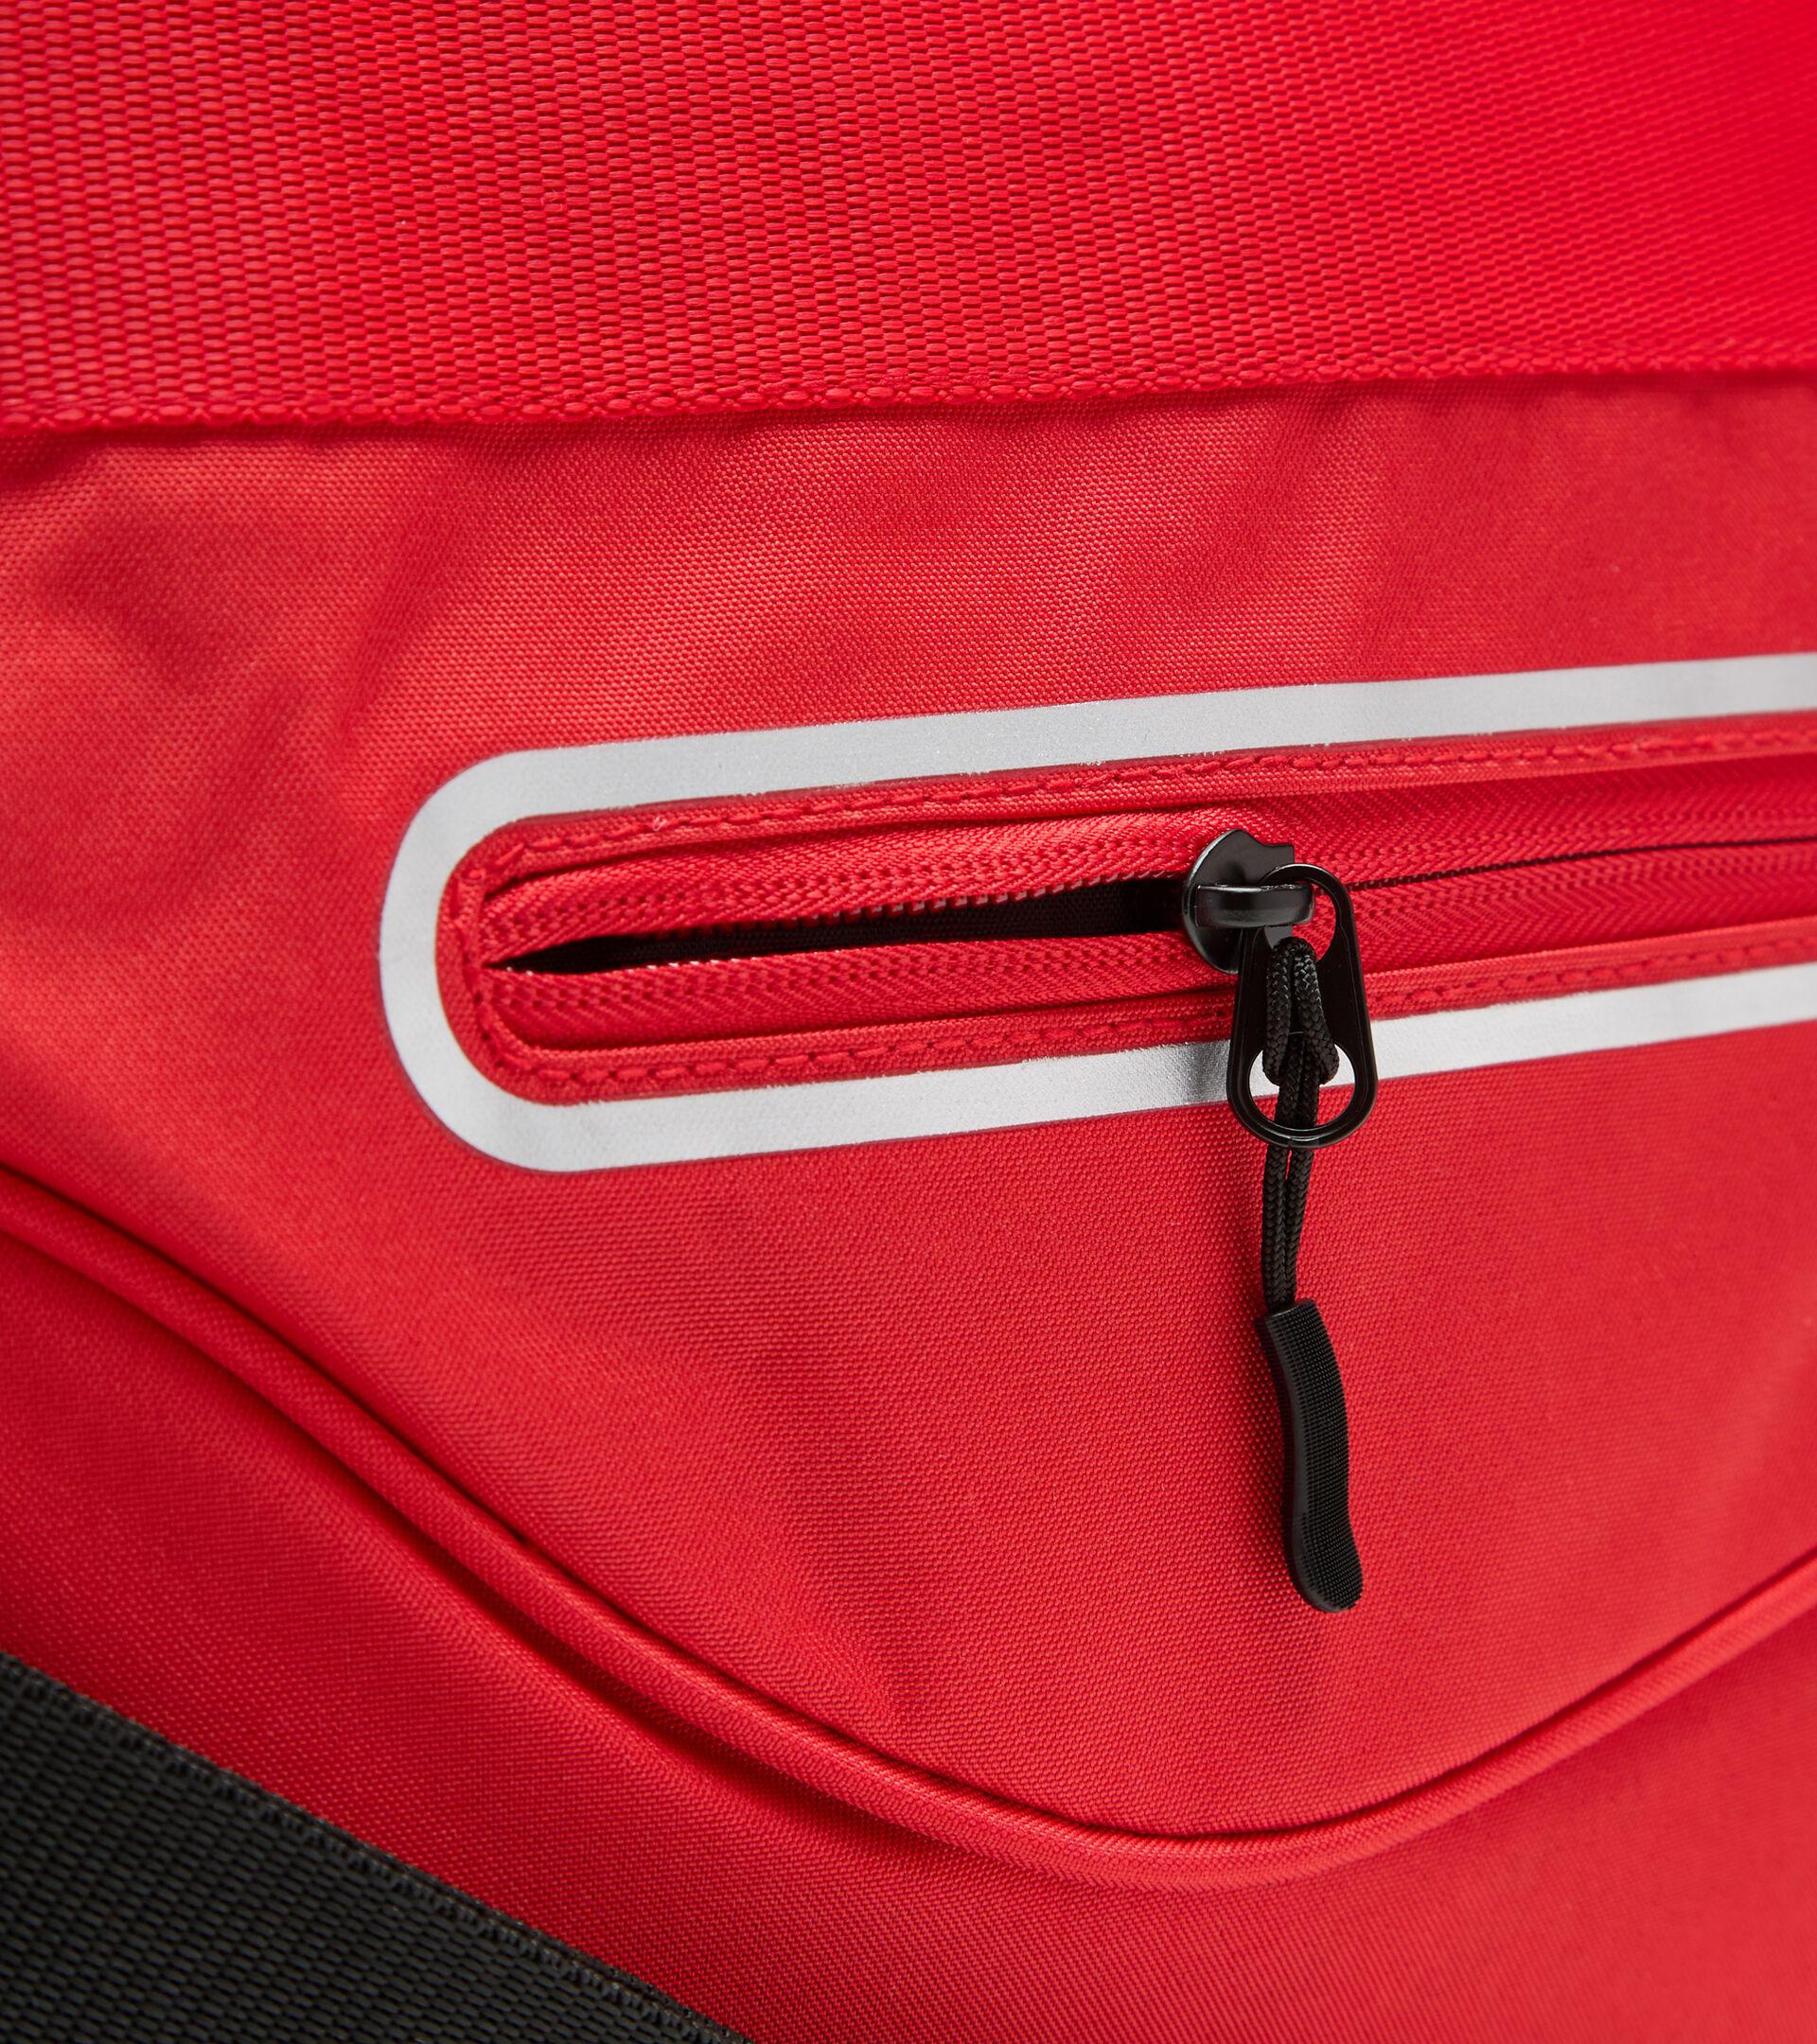 Borsa da training BAG TENNIS TOMATO RED - Diadora